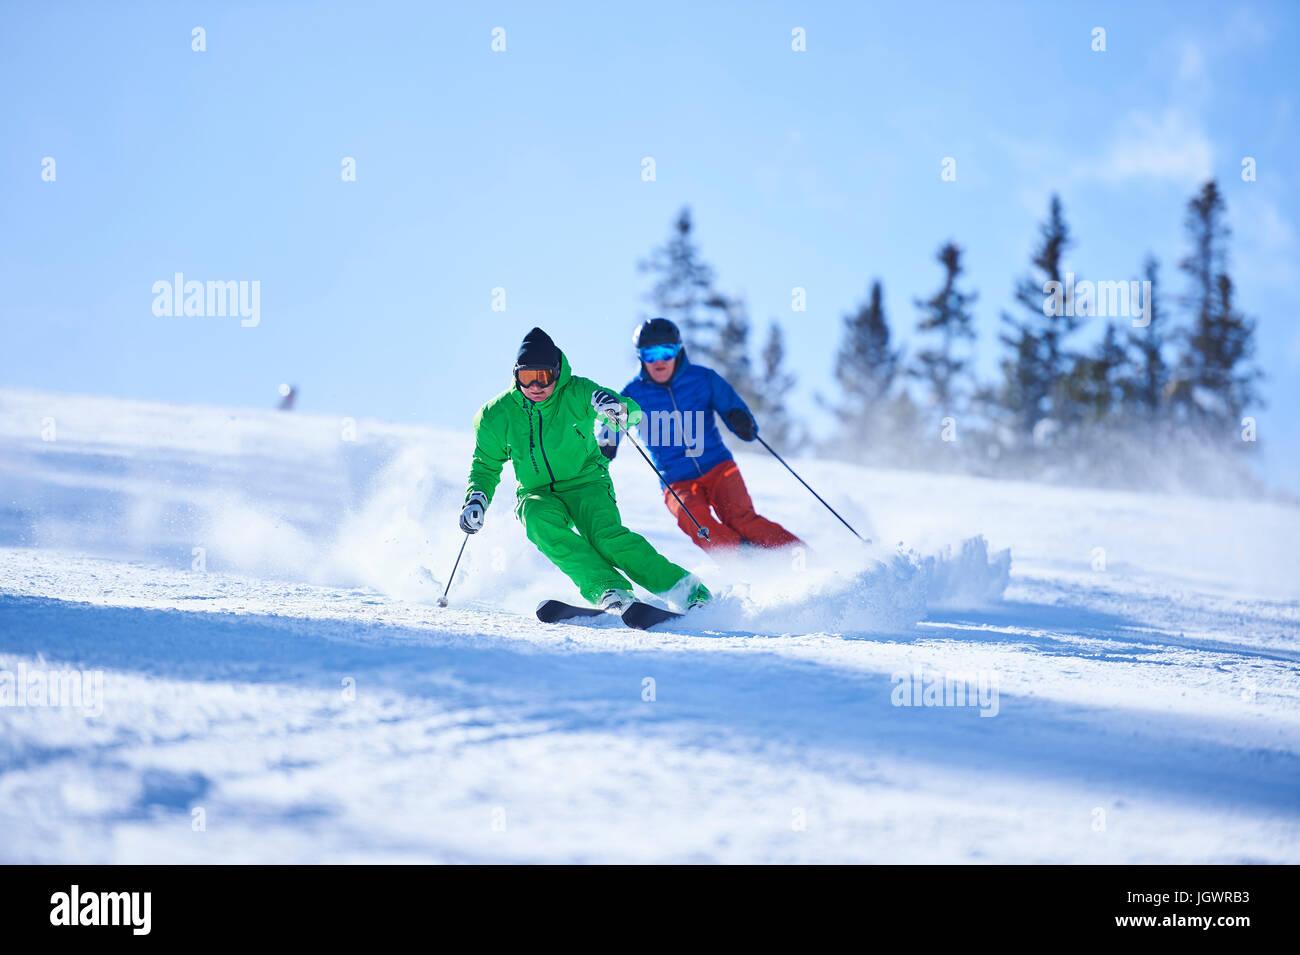 Two men skiing down snow covered ski slope, Aspen, Colorado, USA - Stock Image